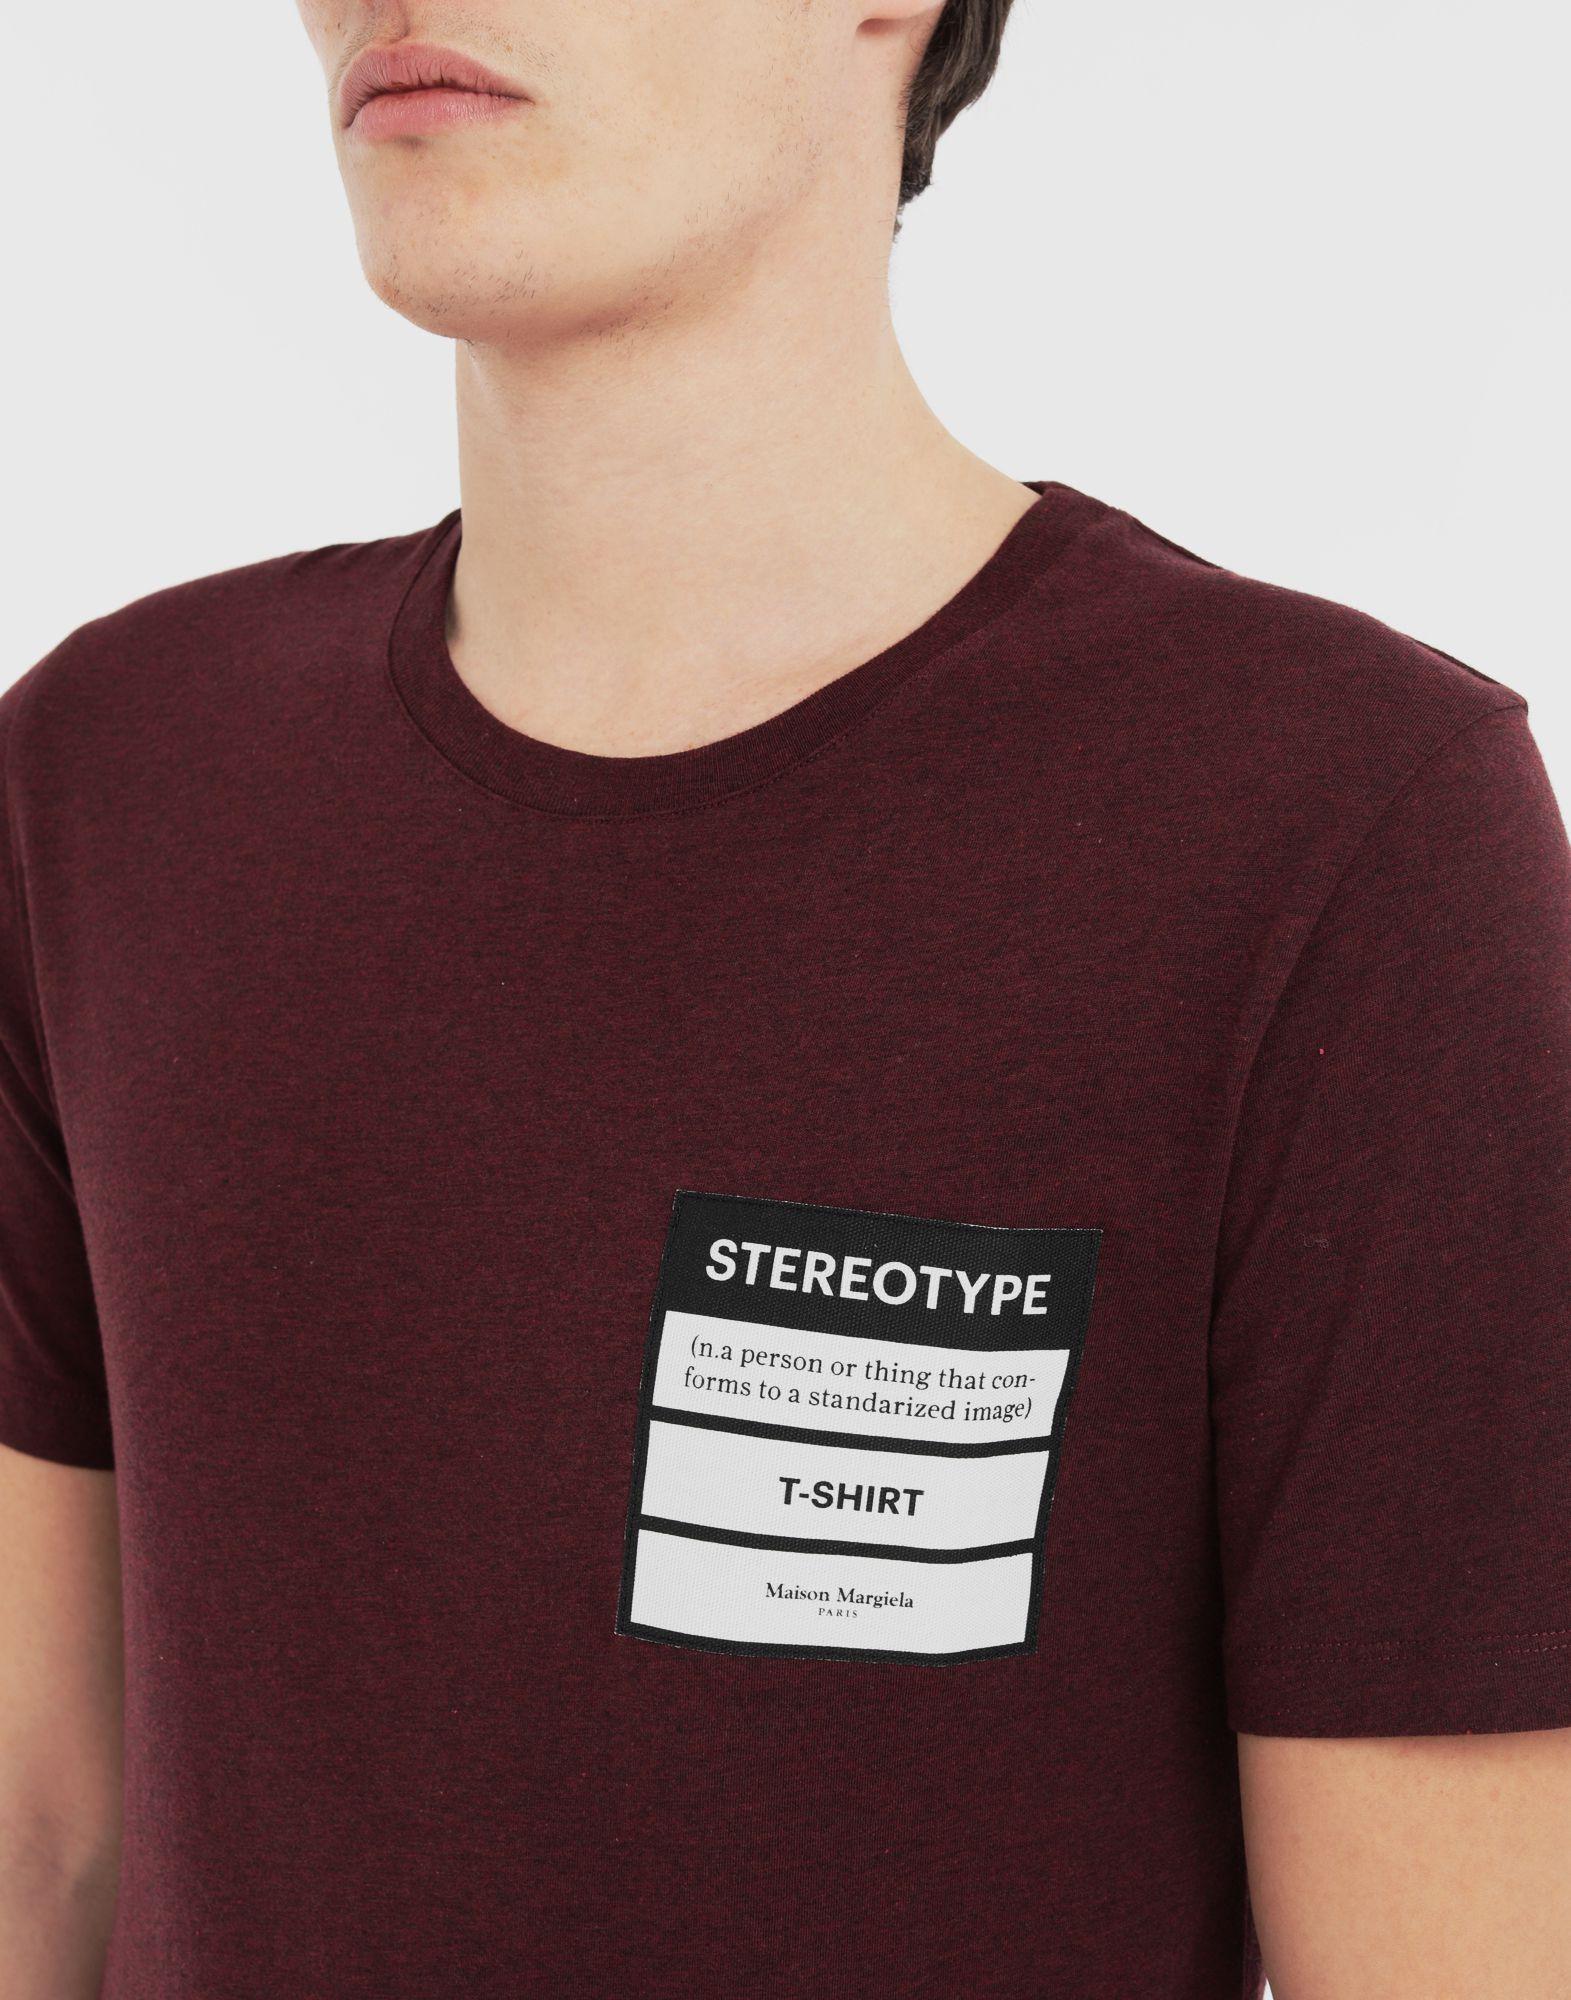 MAISON MARGIELA Camiseta Stereotype Camiseta de manga corta Hombre a